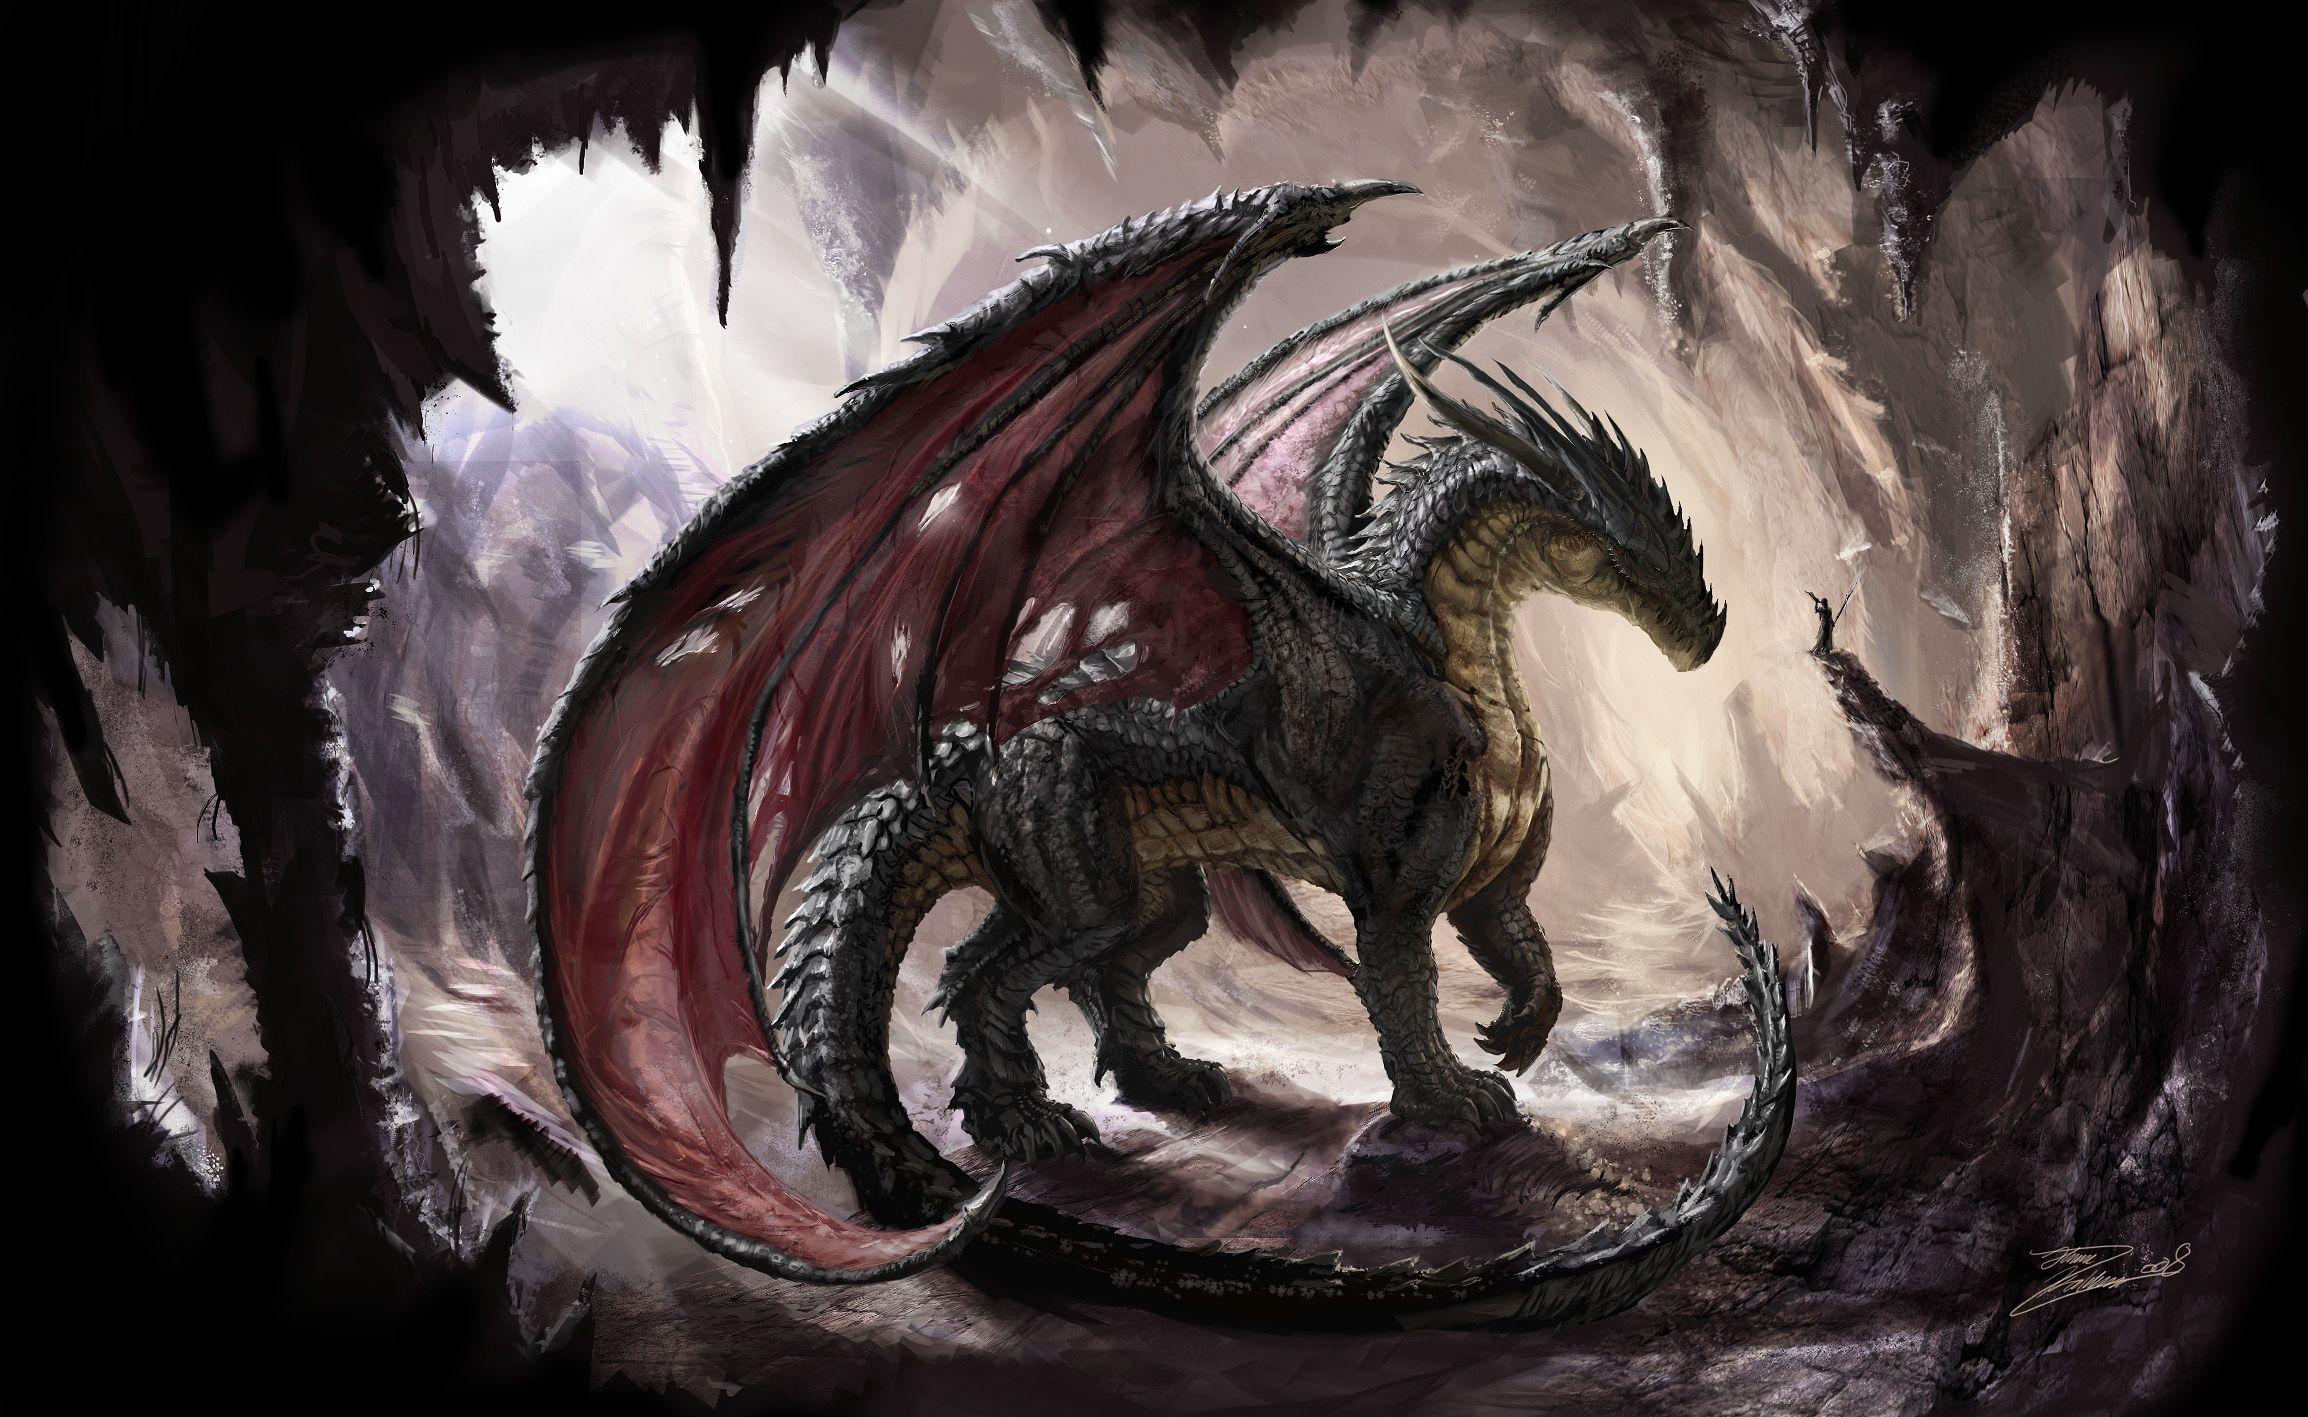 Dark Dargon Dark Dragon Wallpaper Background 2308 X 1417 Id 199621 Wallpaper Dragon Pictures Fantasy Dragon Mythical Creatures